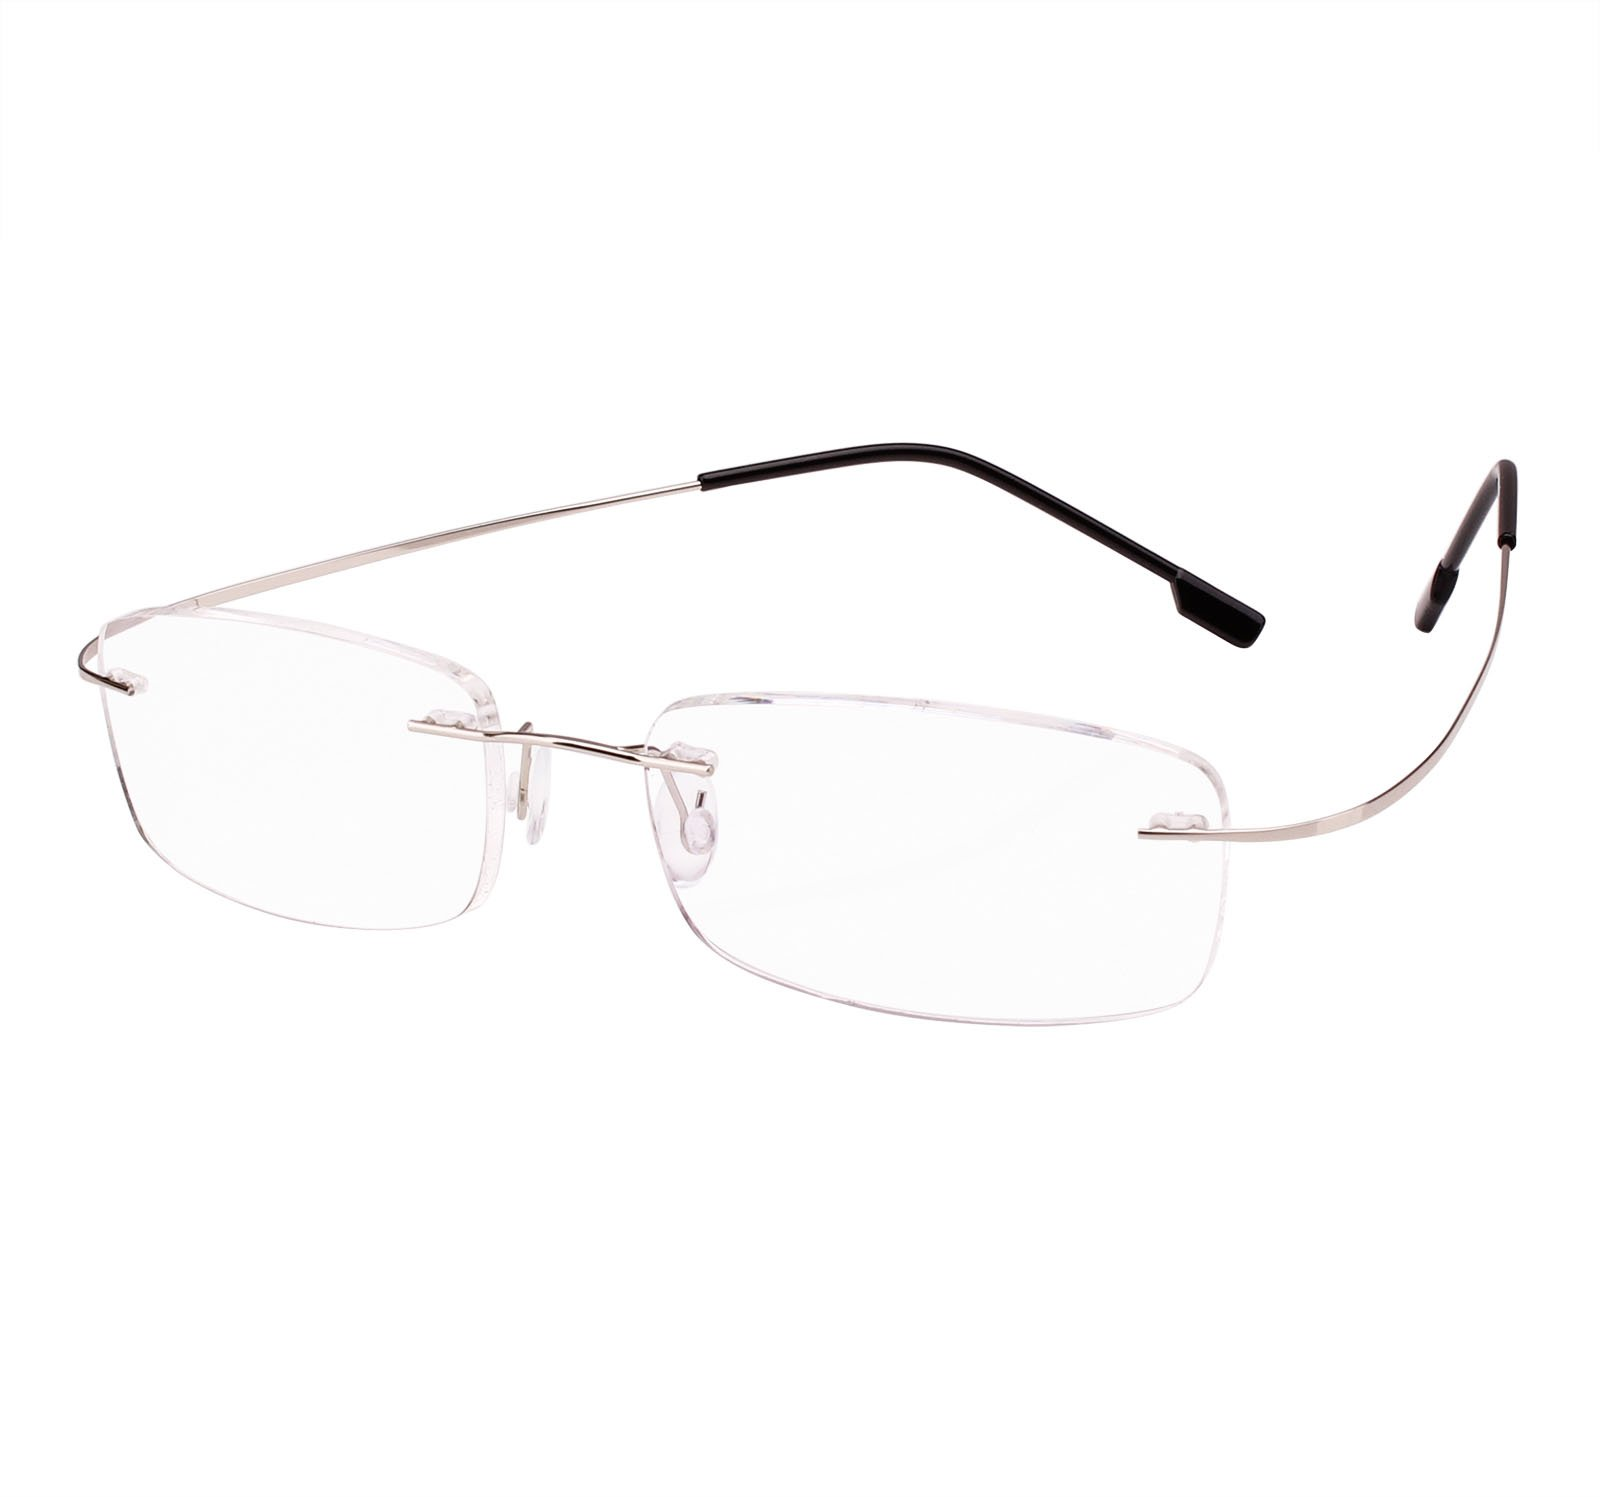 Beison Memory Titanium Stainless Steel Rimless Flexible Reading Glasses (Silver, 2.0)